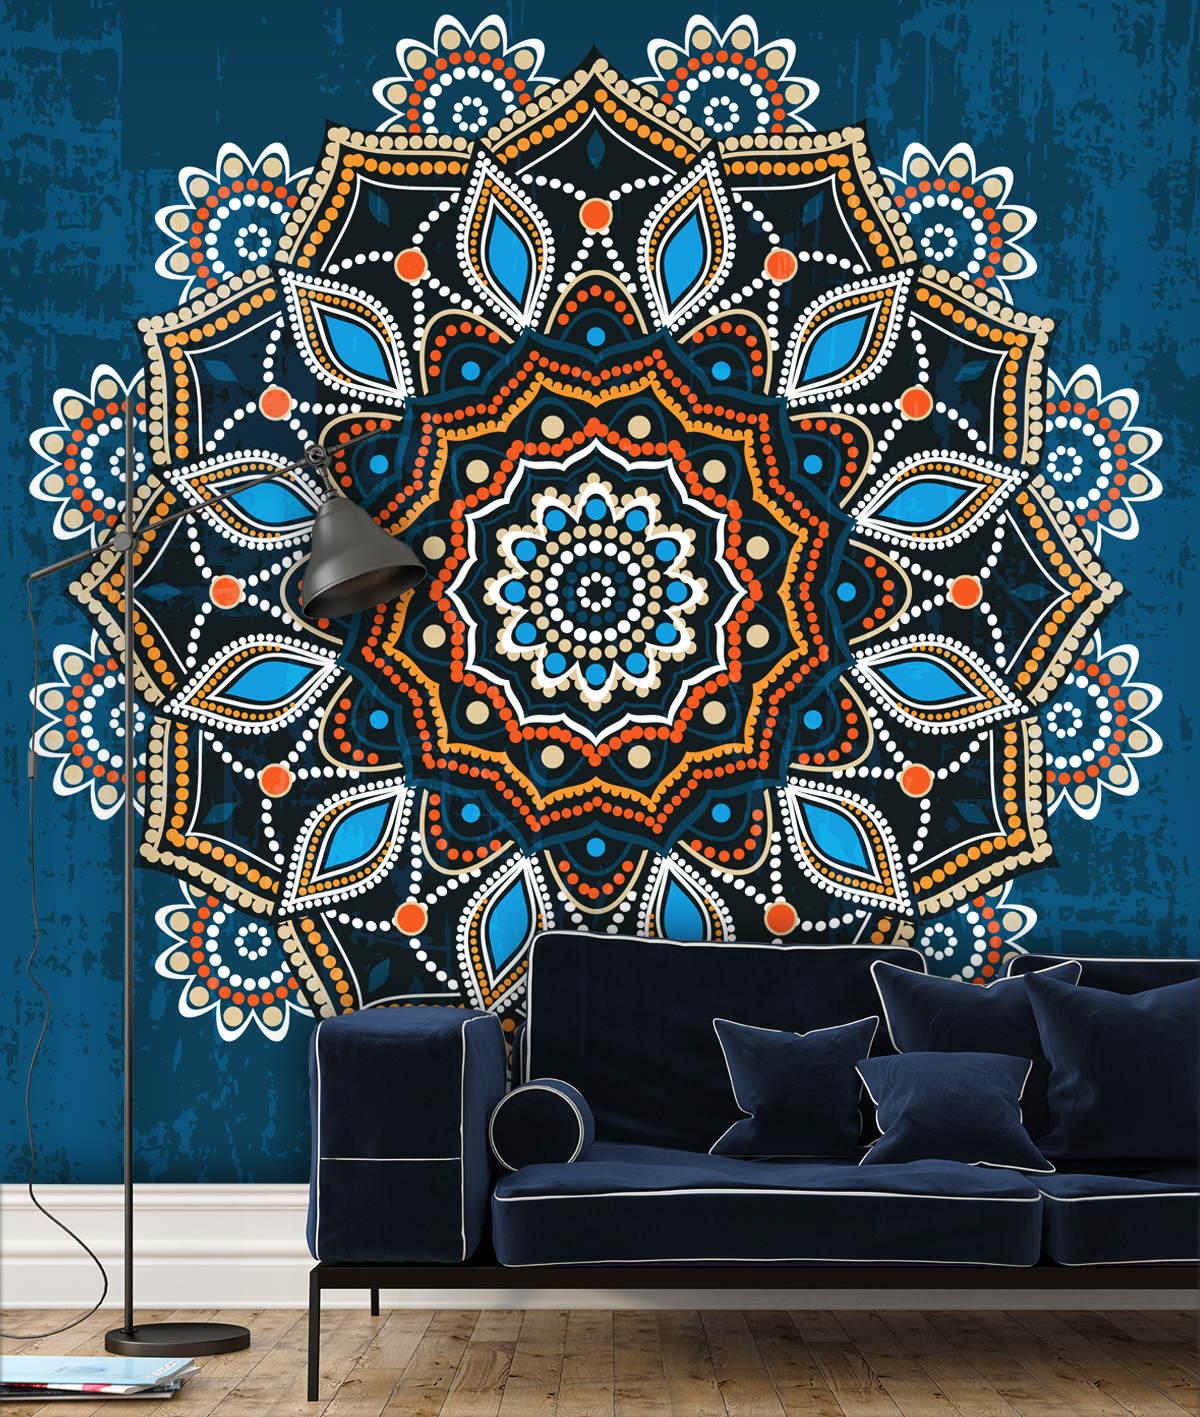 Minimalistic interior with a stylish blue velvet sofa and a modern black floor lamp